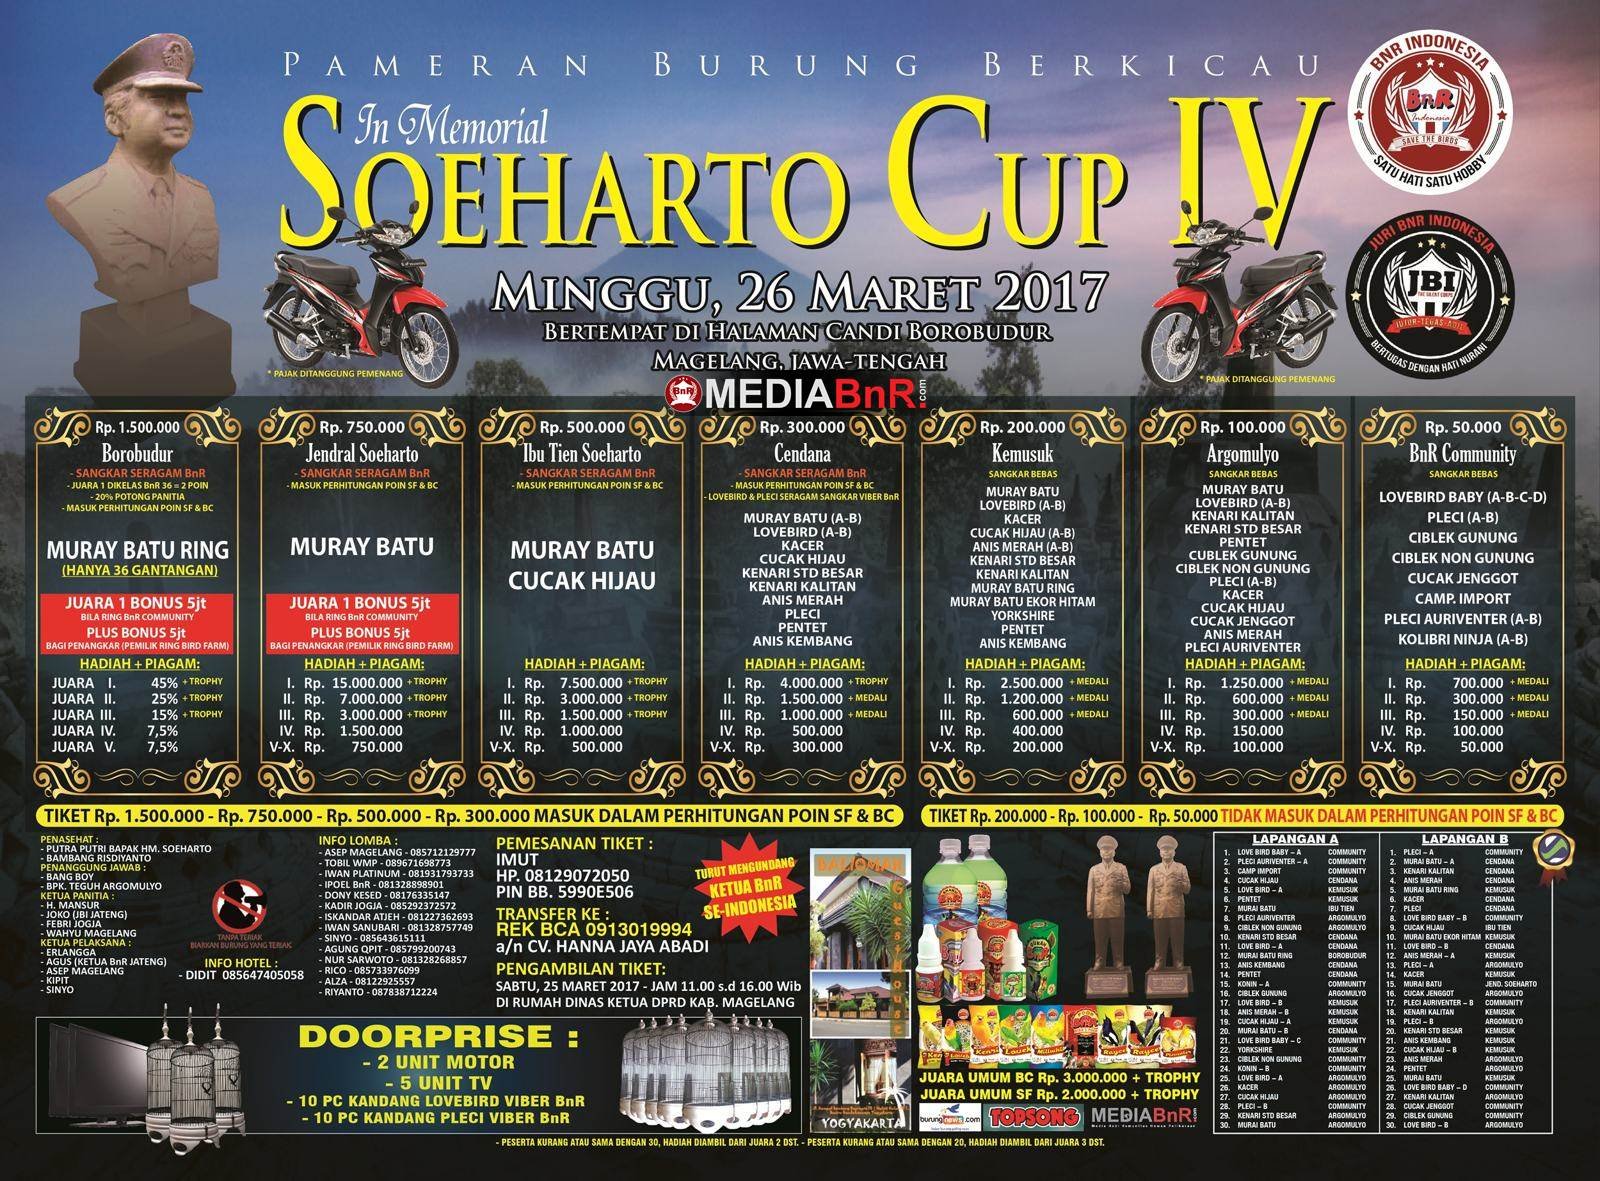 brosur lomba burung kicau soeharto cup borobudur 2017 terbaru